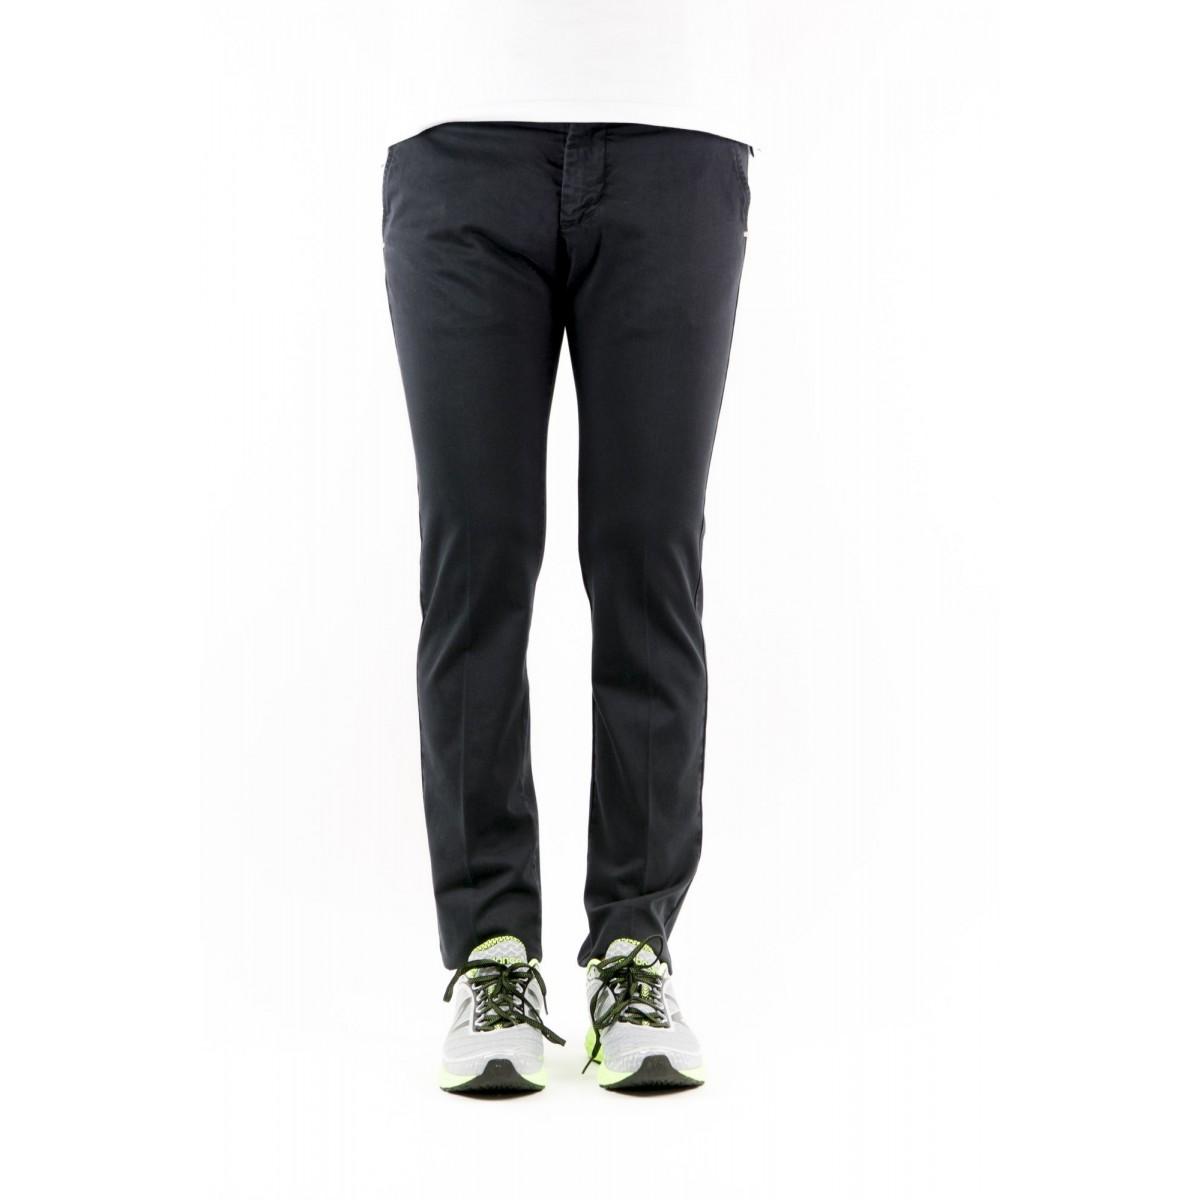 Trousers Entre Amis - 8201 292L17 Gabardina Strech 0401 - blu navy